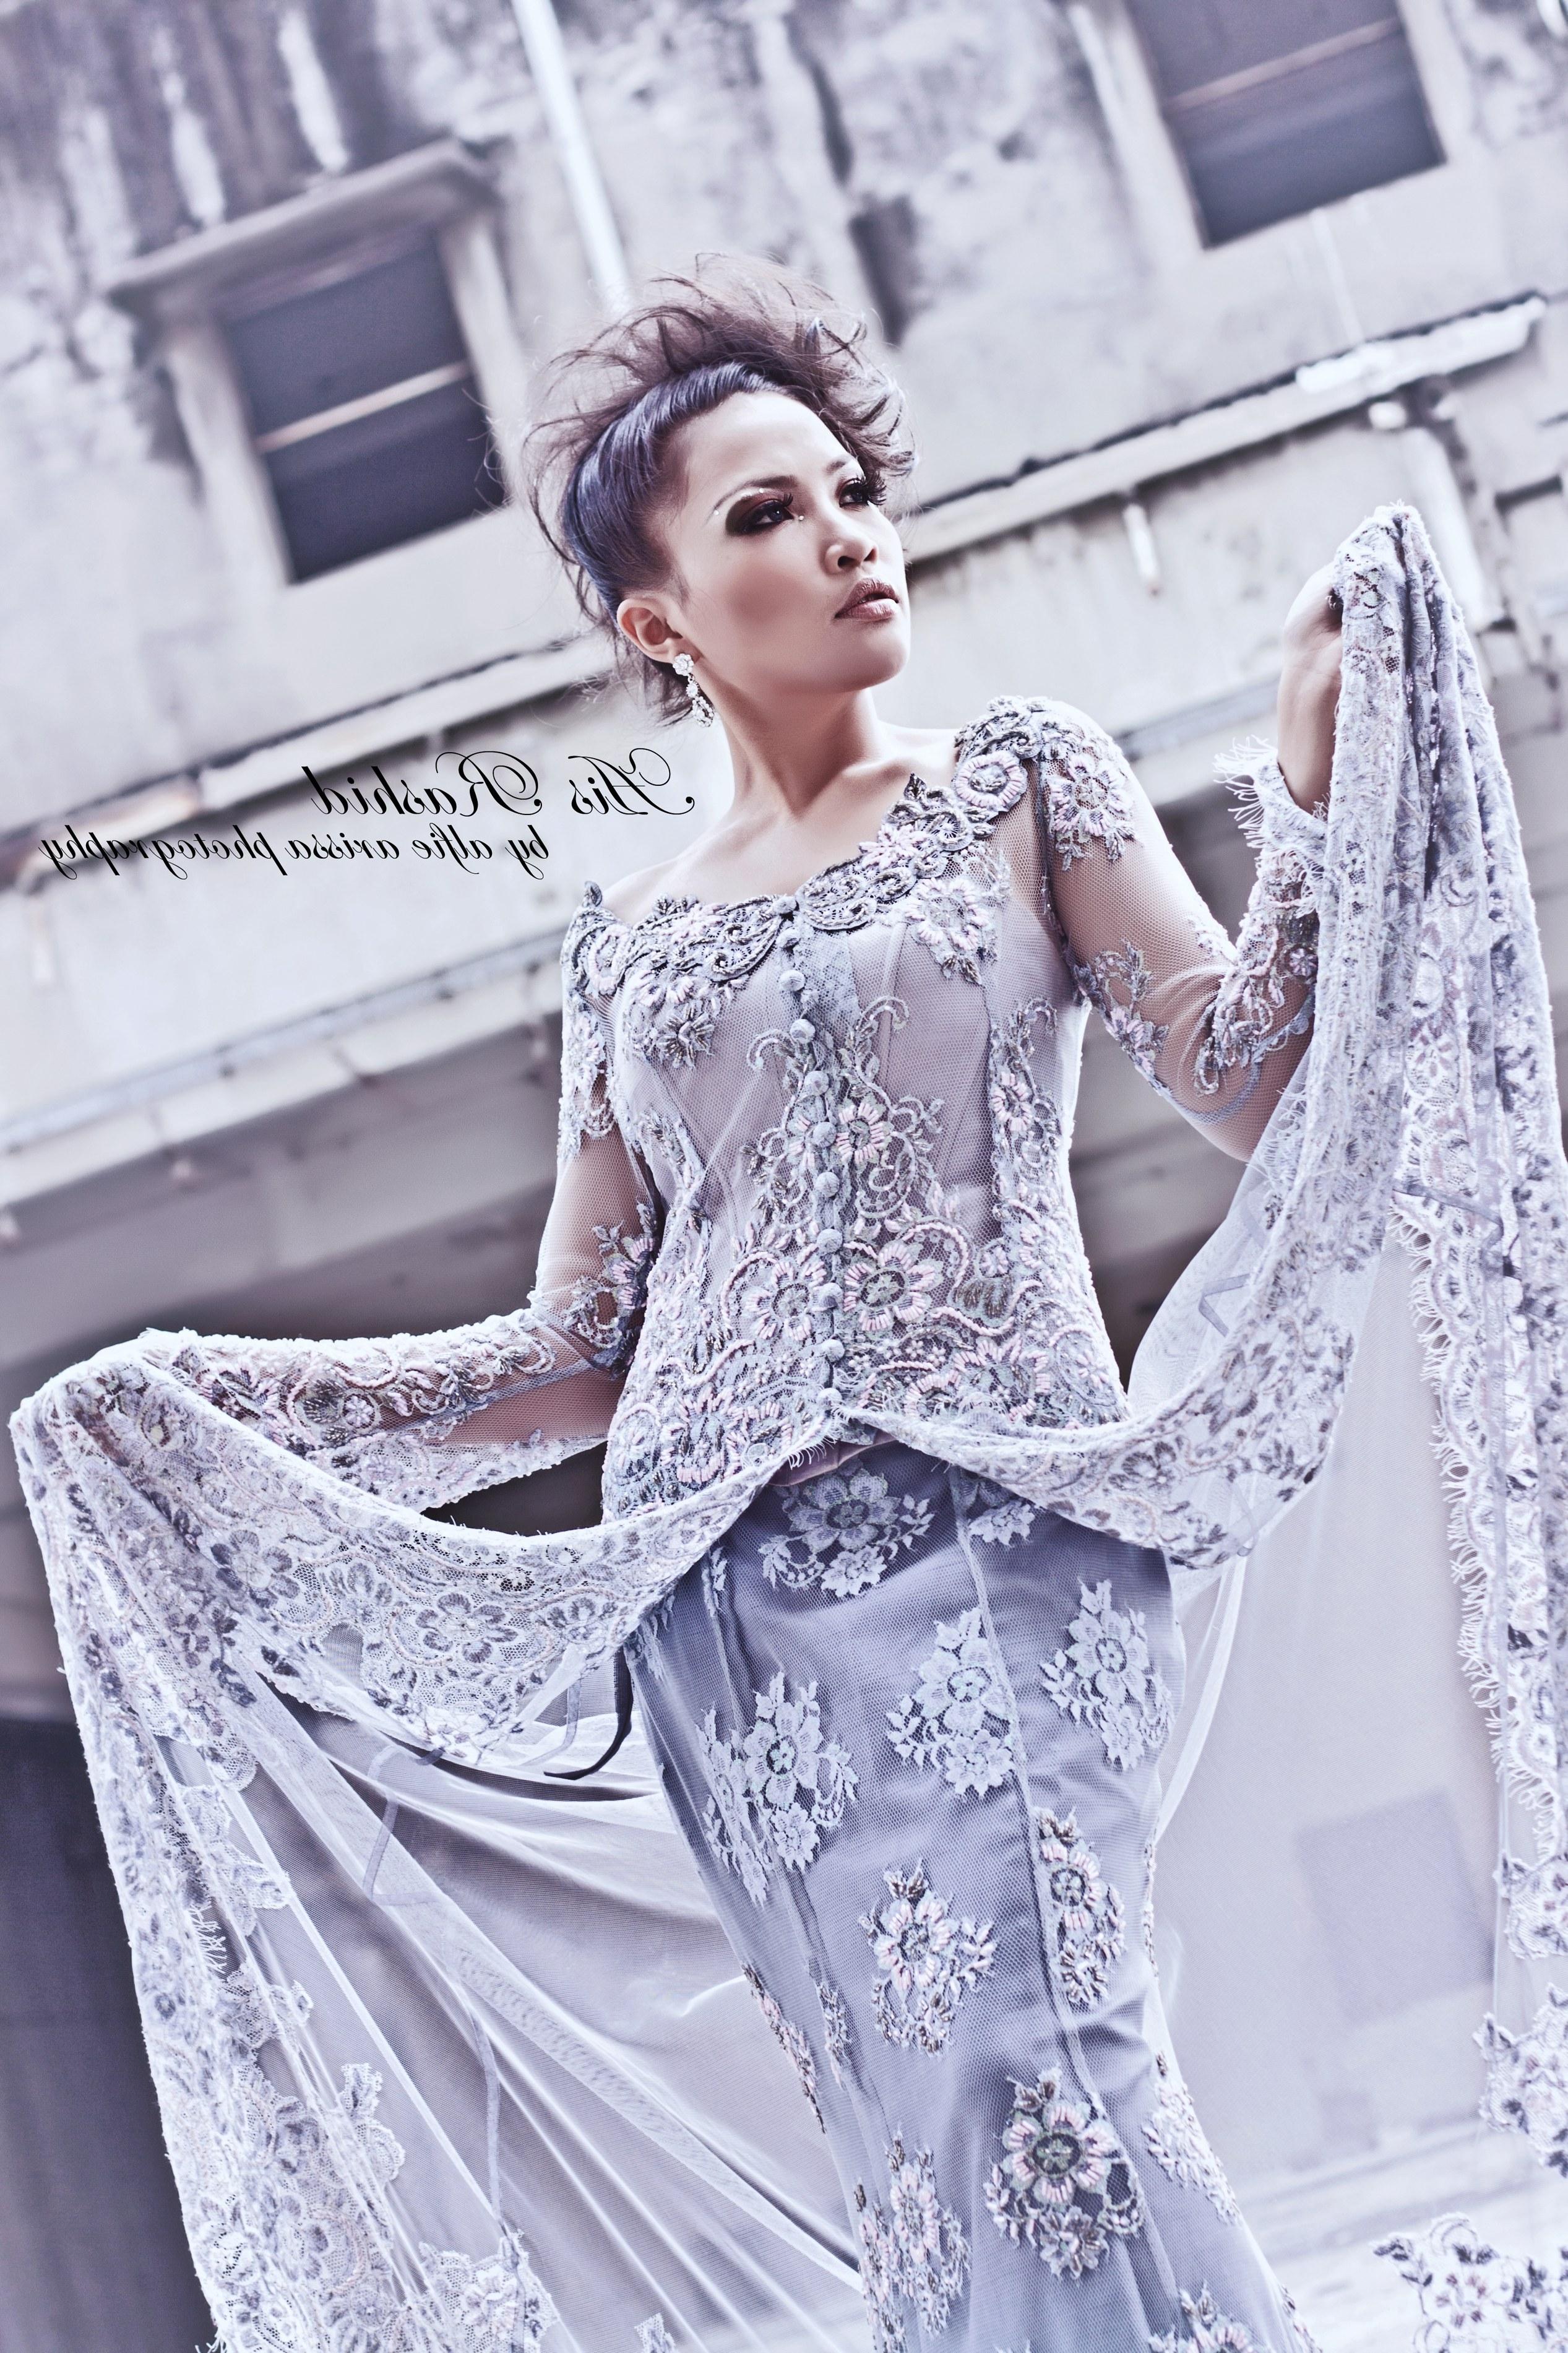 Bentuk Model Baju Pengantin Muslimah Terbaru Wddj Wedding Pakage